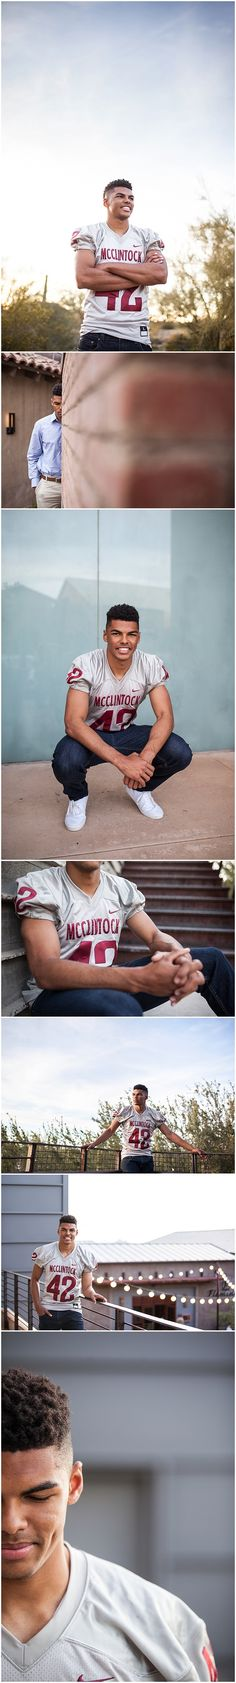 Senior boy portraits industrial desert high school senior pictures with football jersey